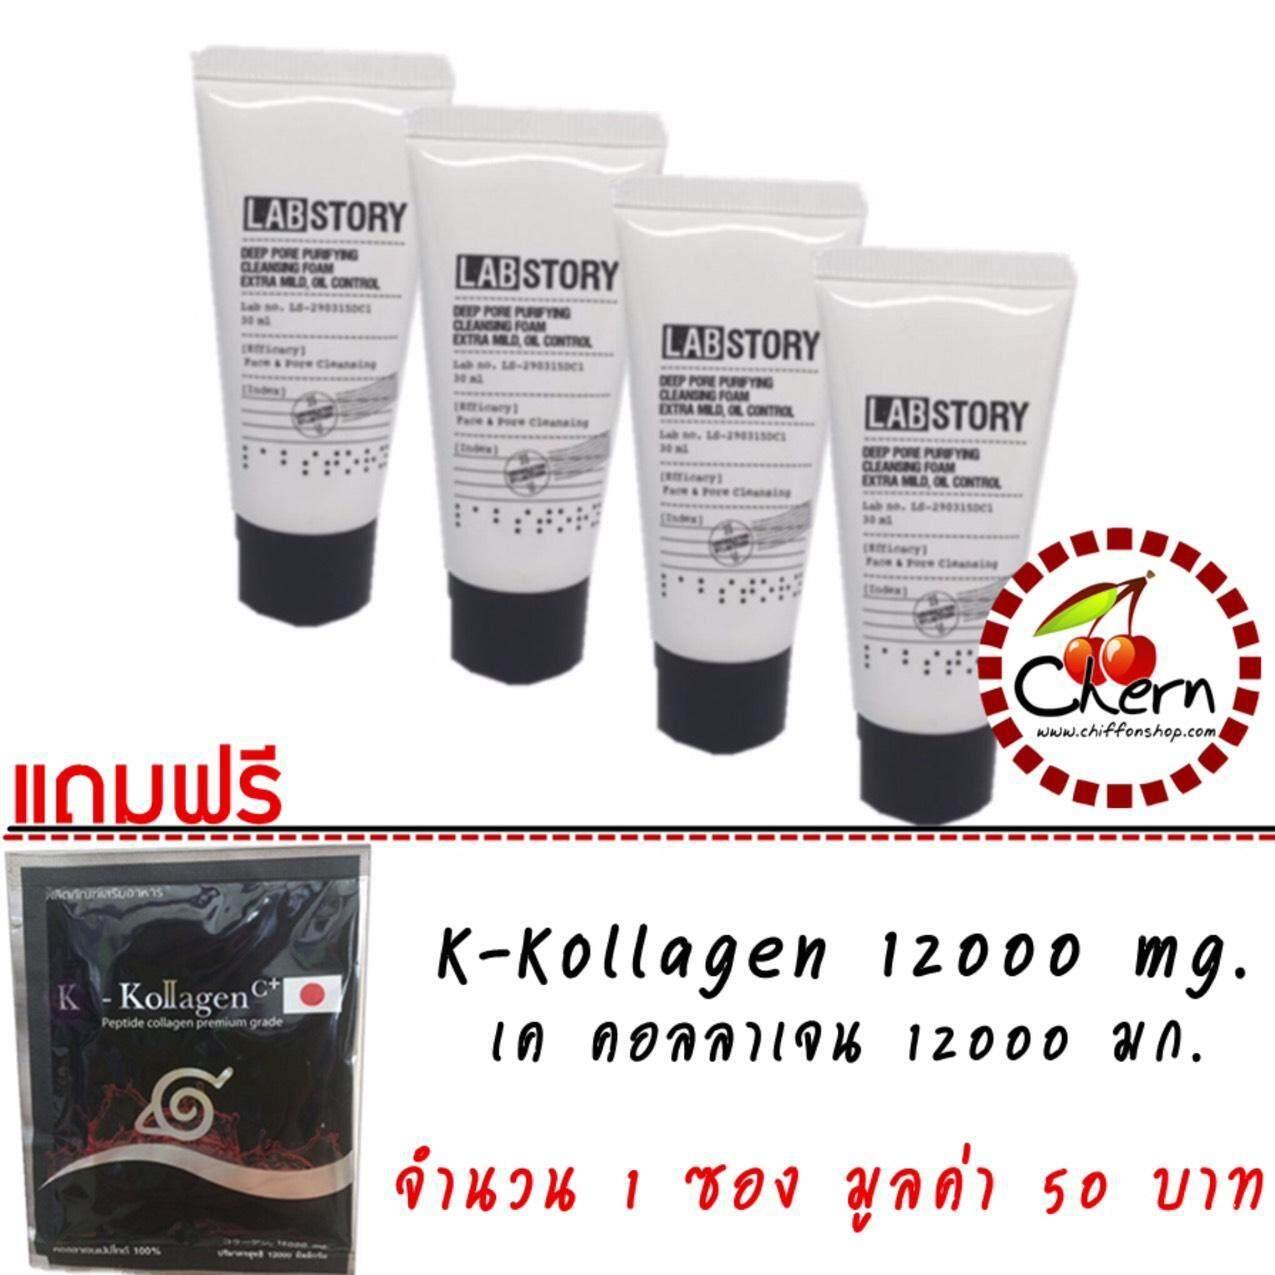 Labstory Deep Pore Purifying Cleansing Foam Extra Mild Oil Controlแล็ปสตอรี่ ดีพ พอร์ คลีนซิ่งโฟม 30 Ml 4หลอด เป็นต้นฉบับ